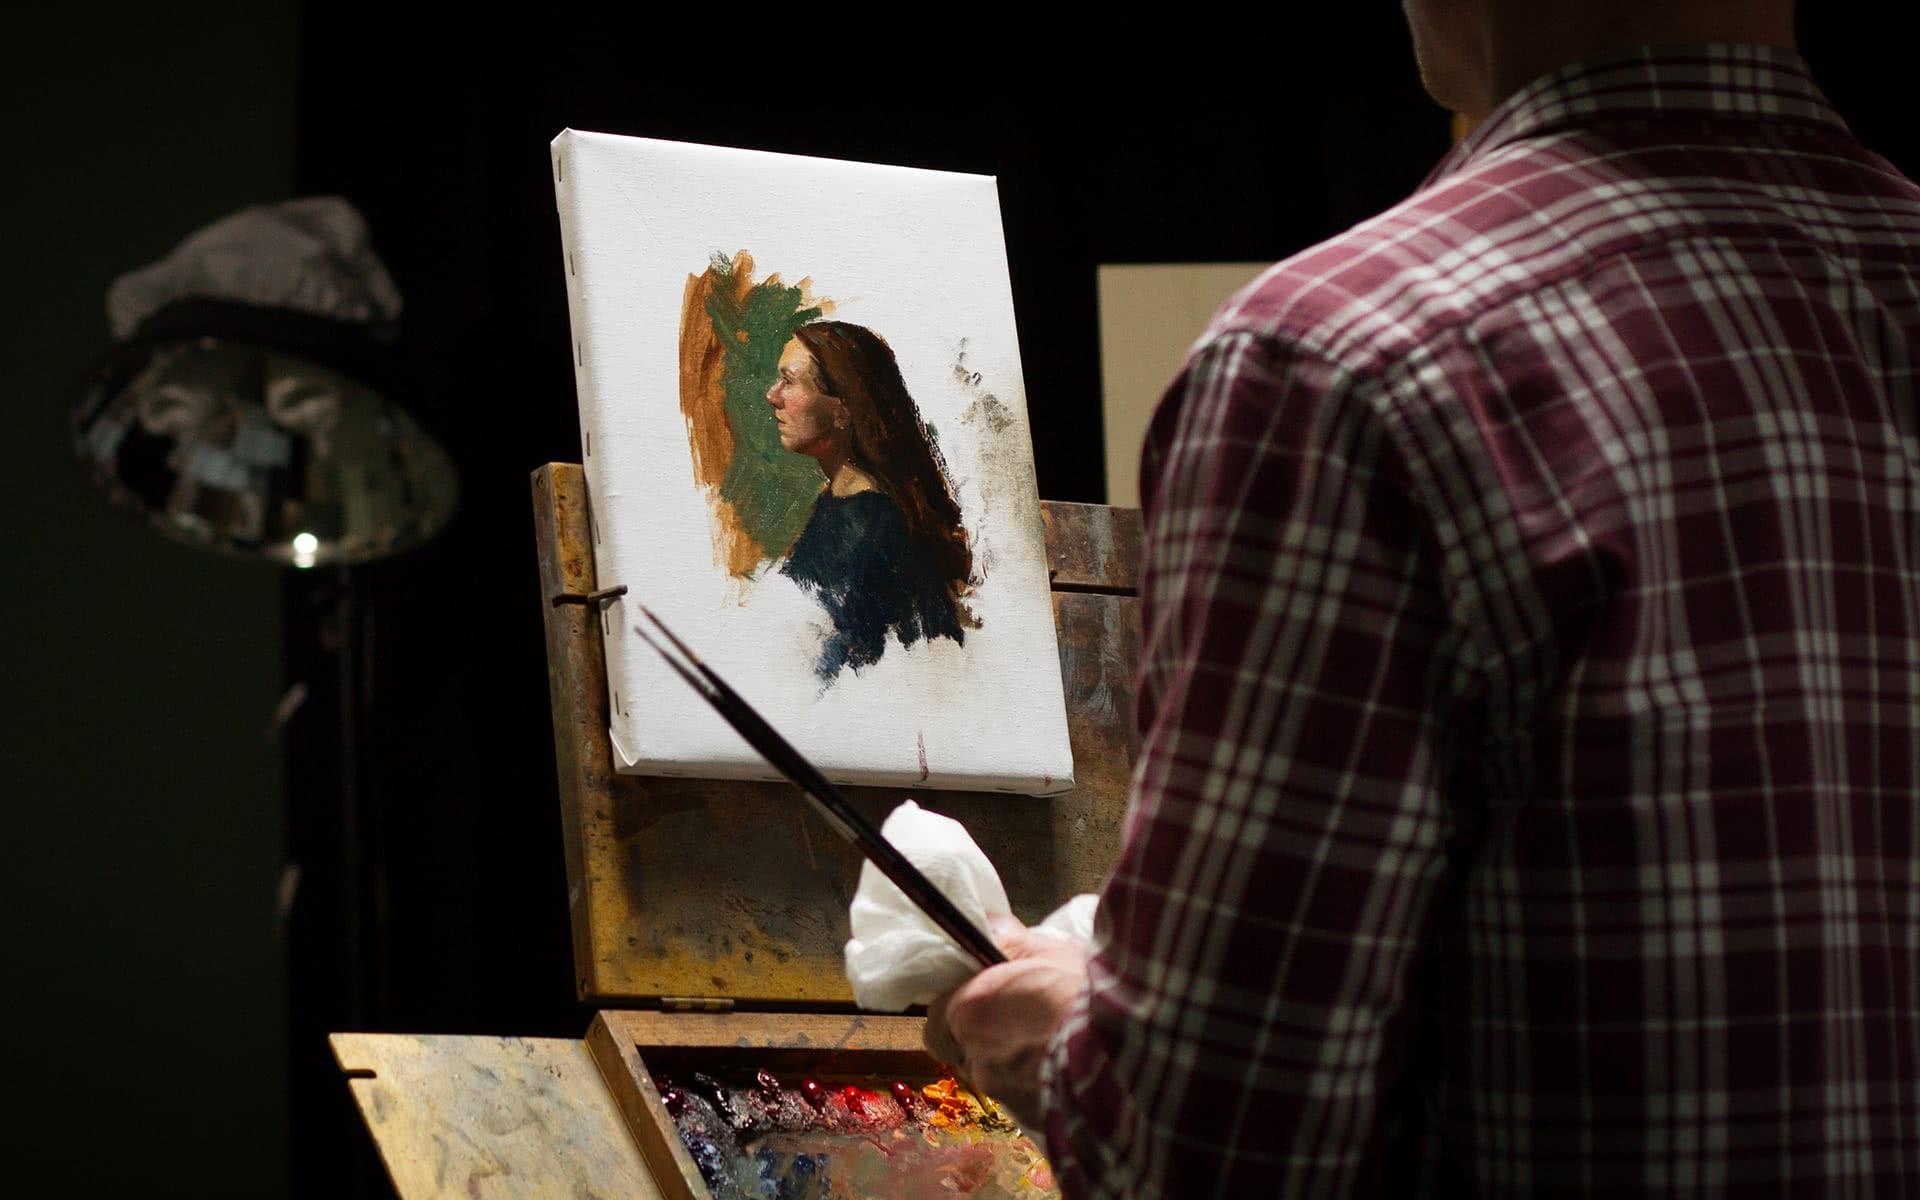 academy portrait malen oel 01 - Is art still considered a profession nowadays?